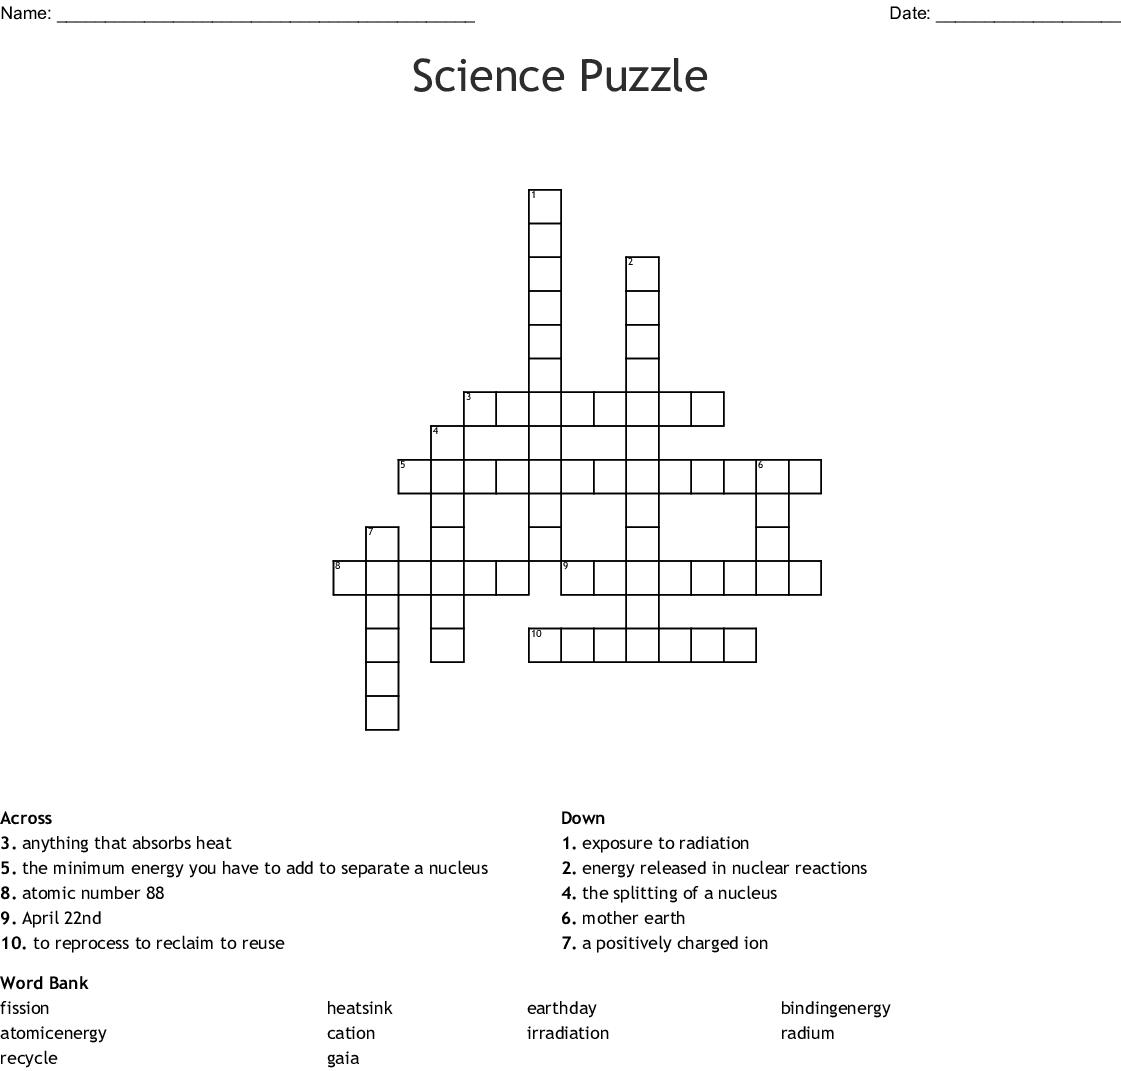 Science Puzzle Crossword